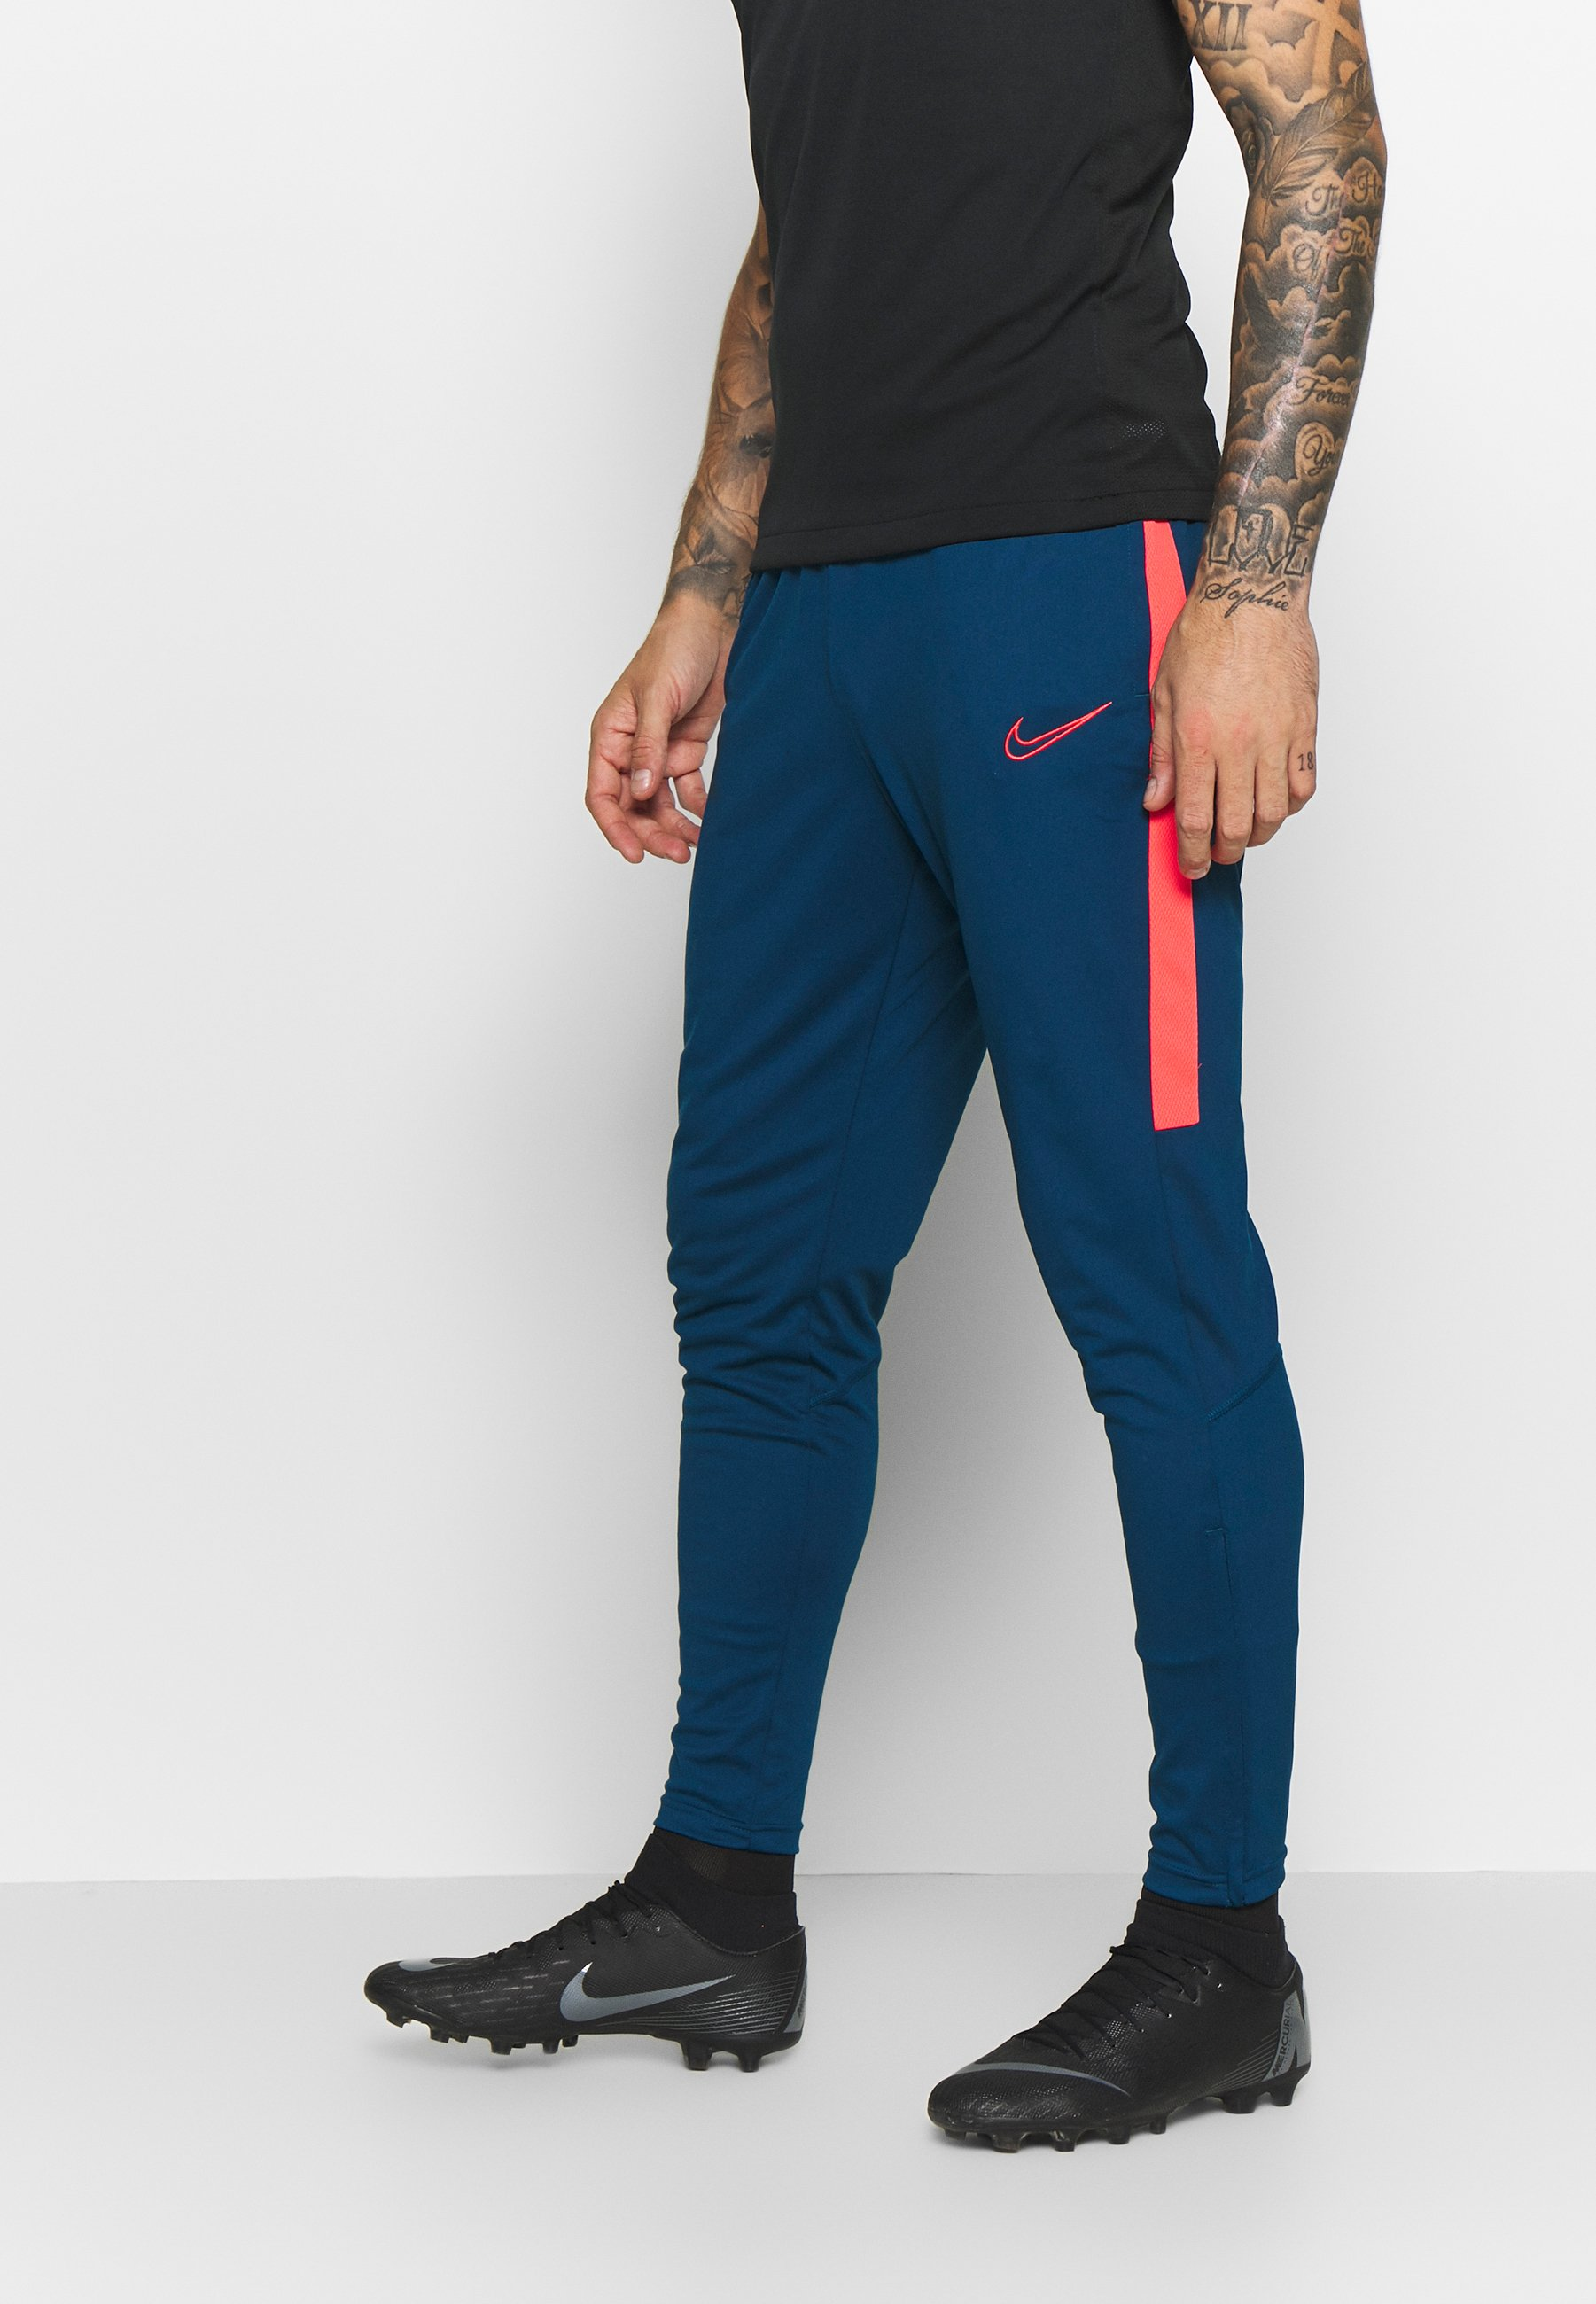 NIKE DRI FIT ACADEMY HERREN FUBBALLHOSE Pantalon de survêtement valerian blue